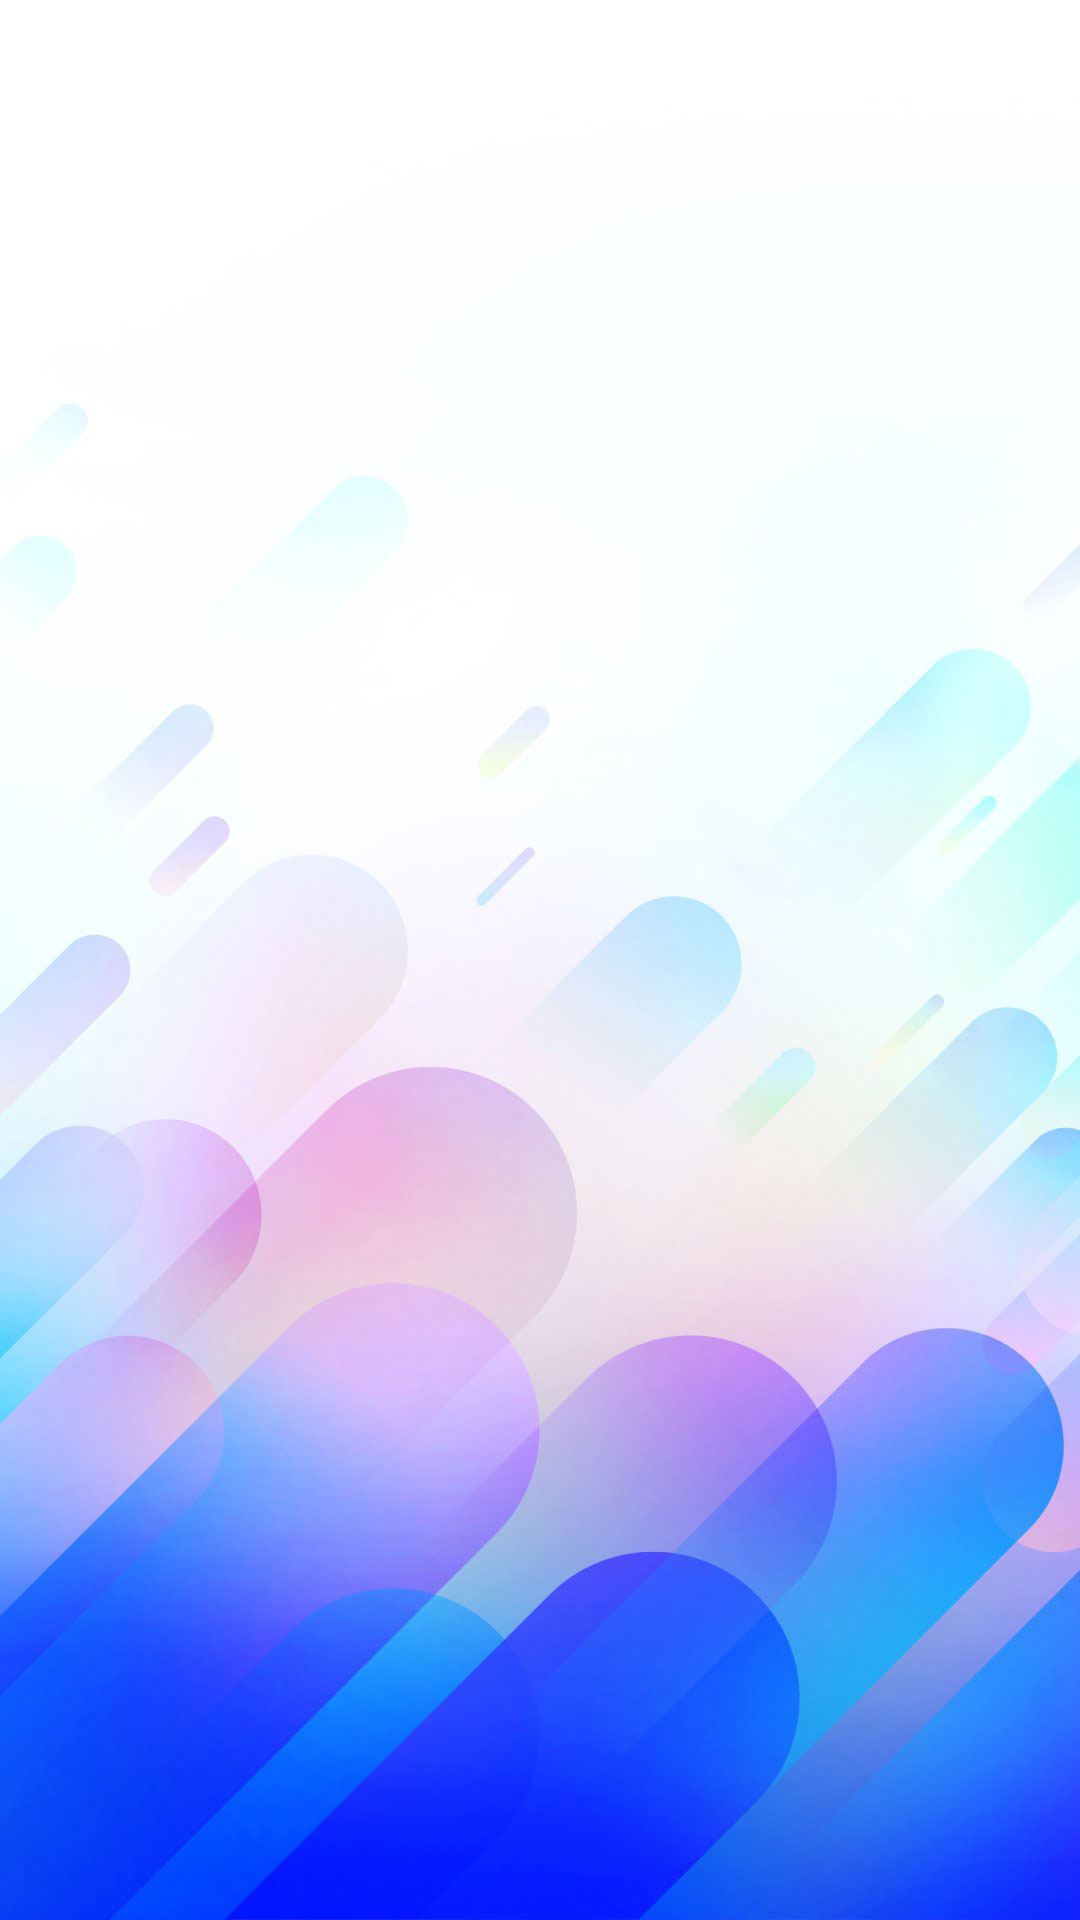 Download Meizu M3 Note Lockscreen Wallpaper Now